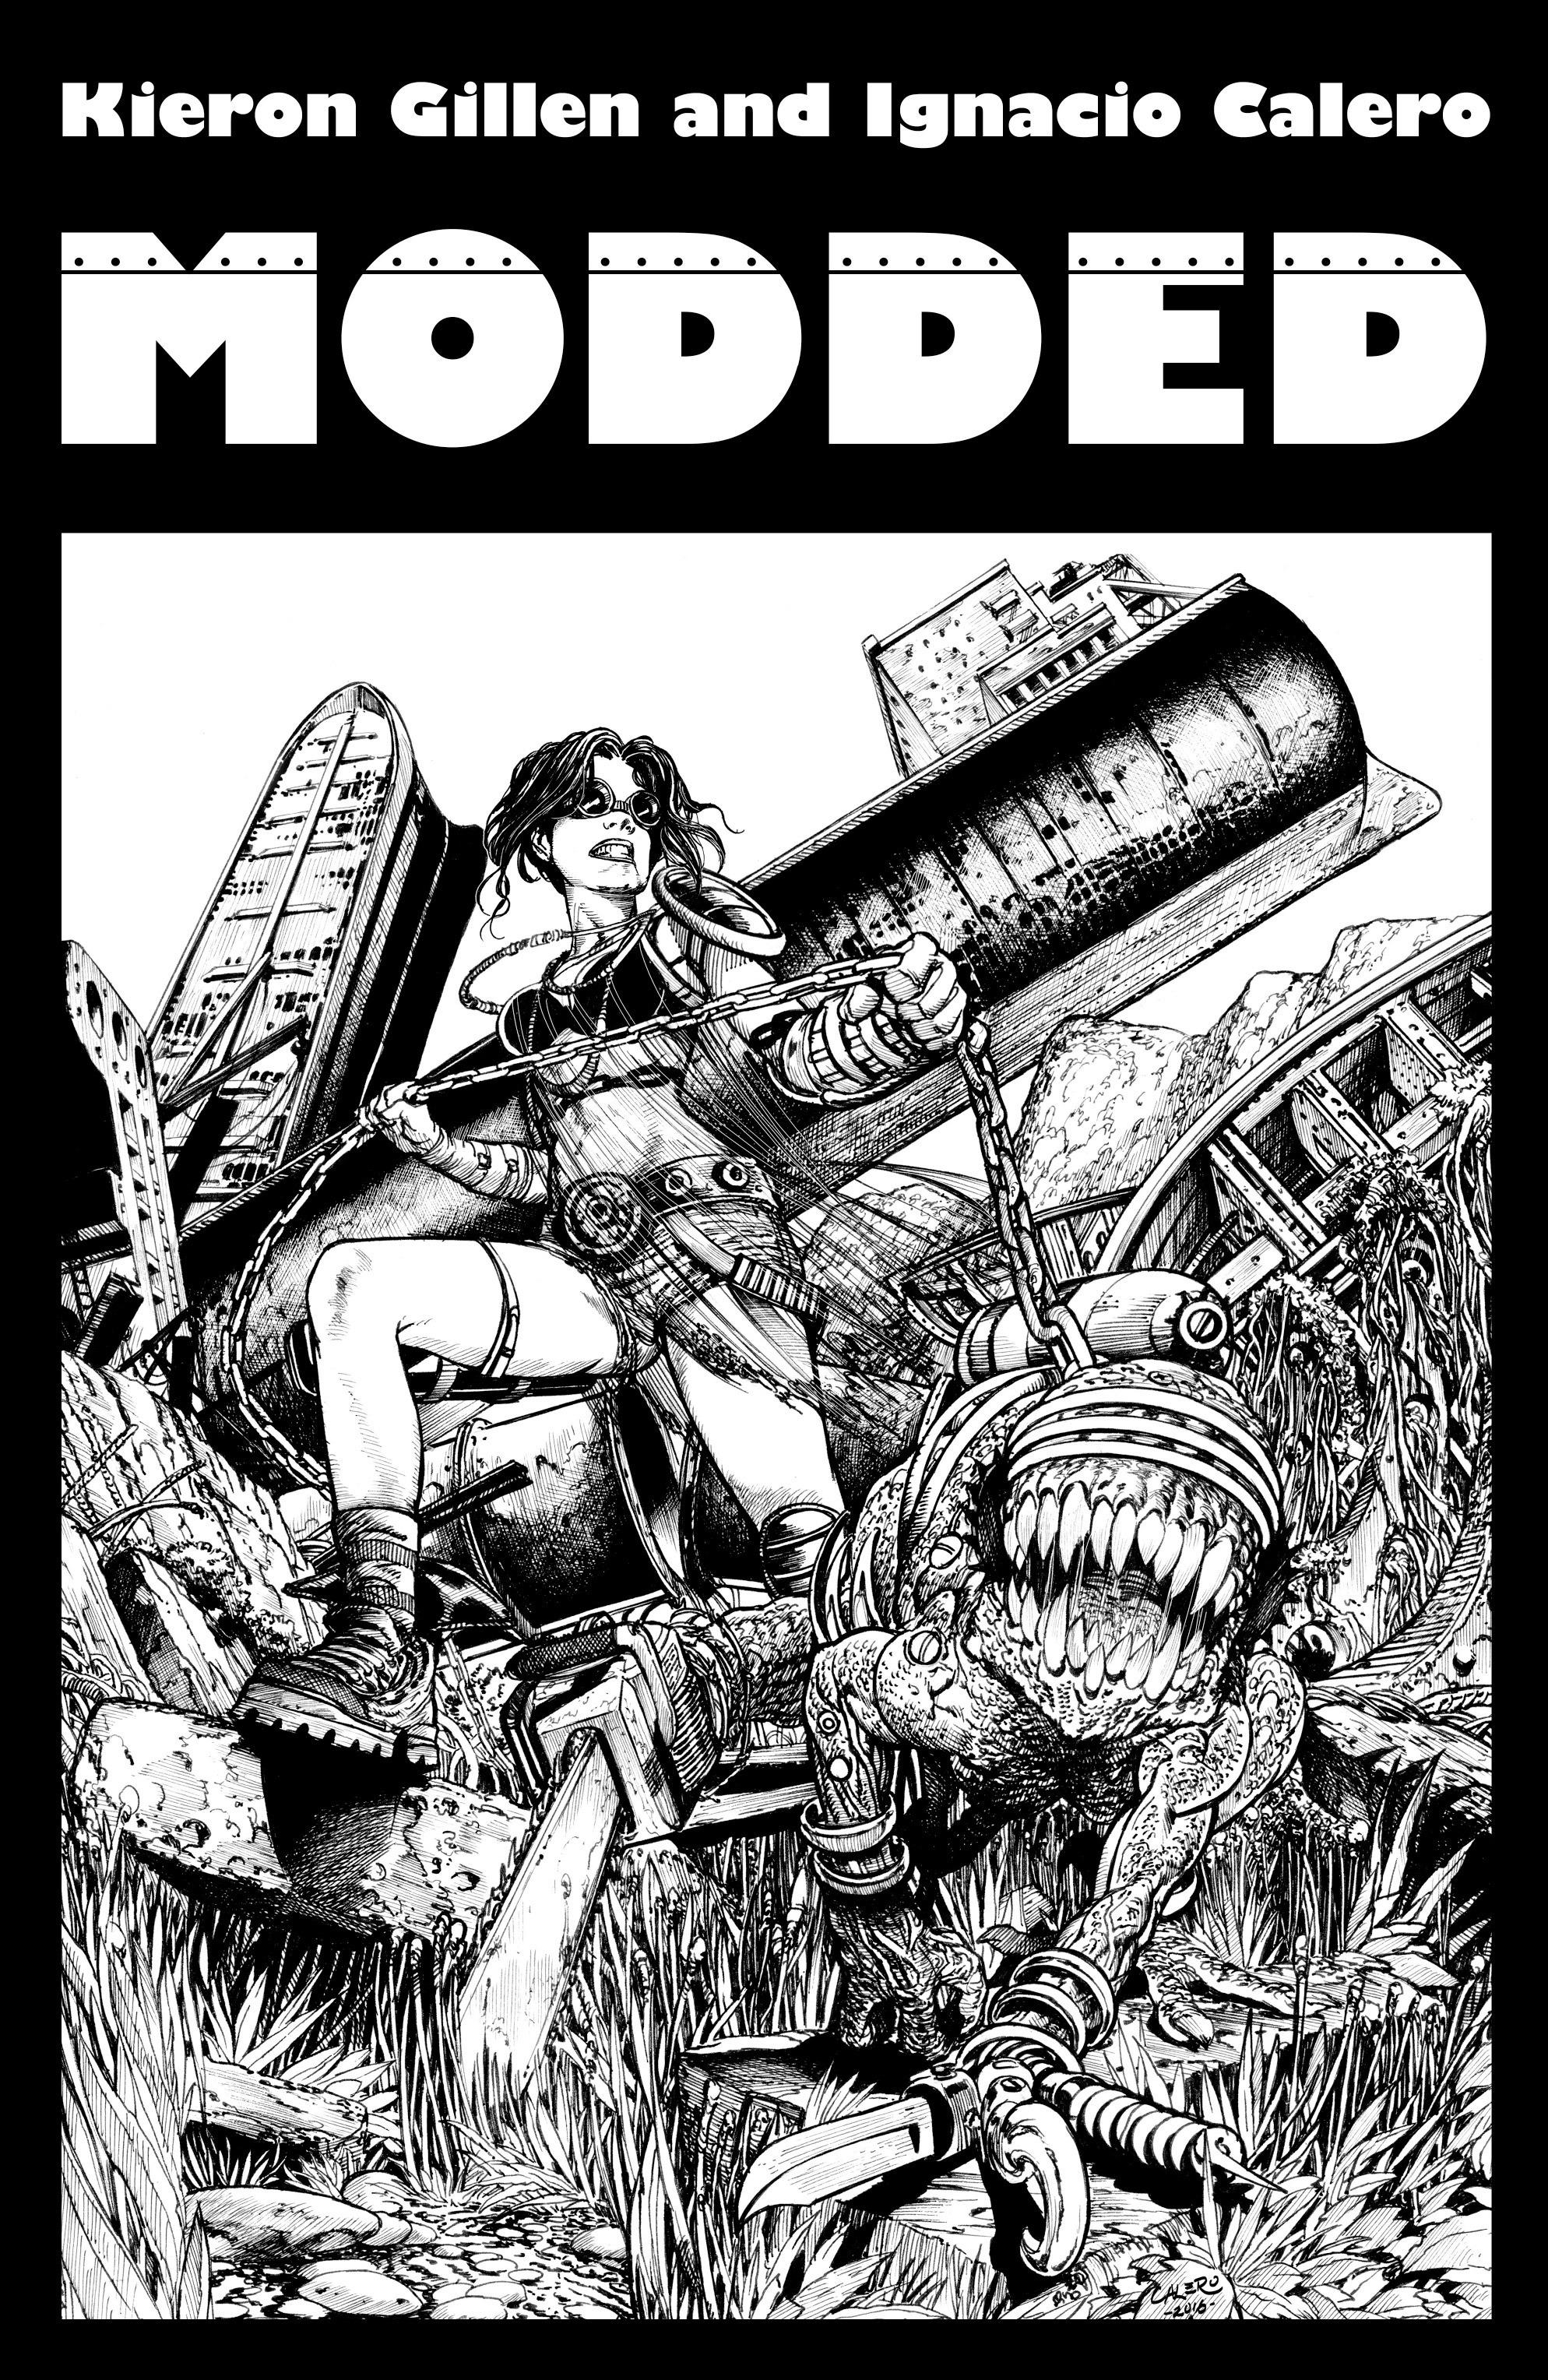 Read online Alan Moore's Cinema Purgatorio comic -  Issue #1 - 23